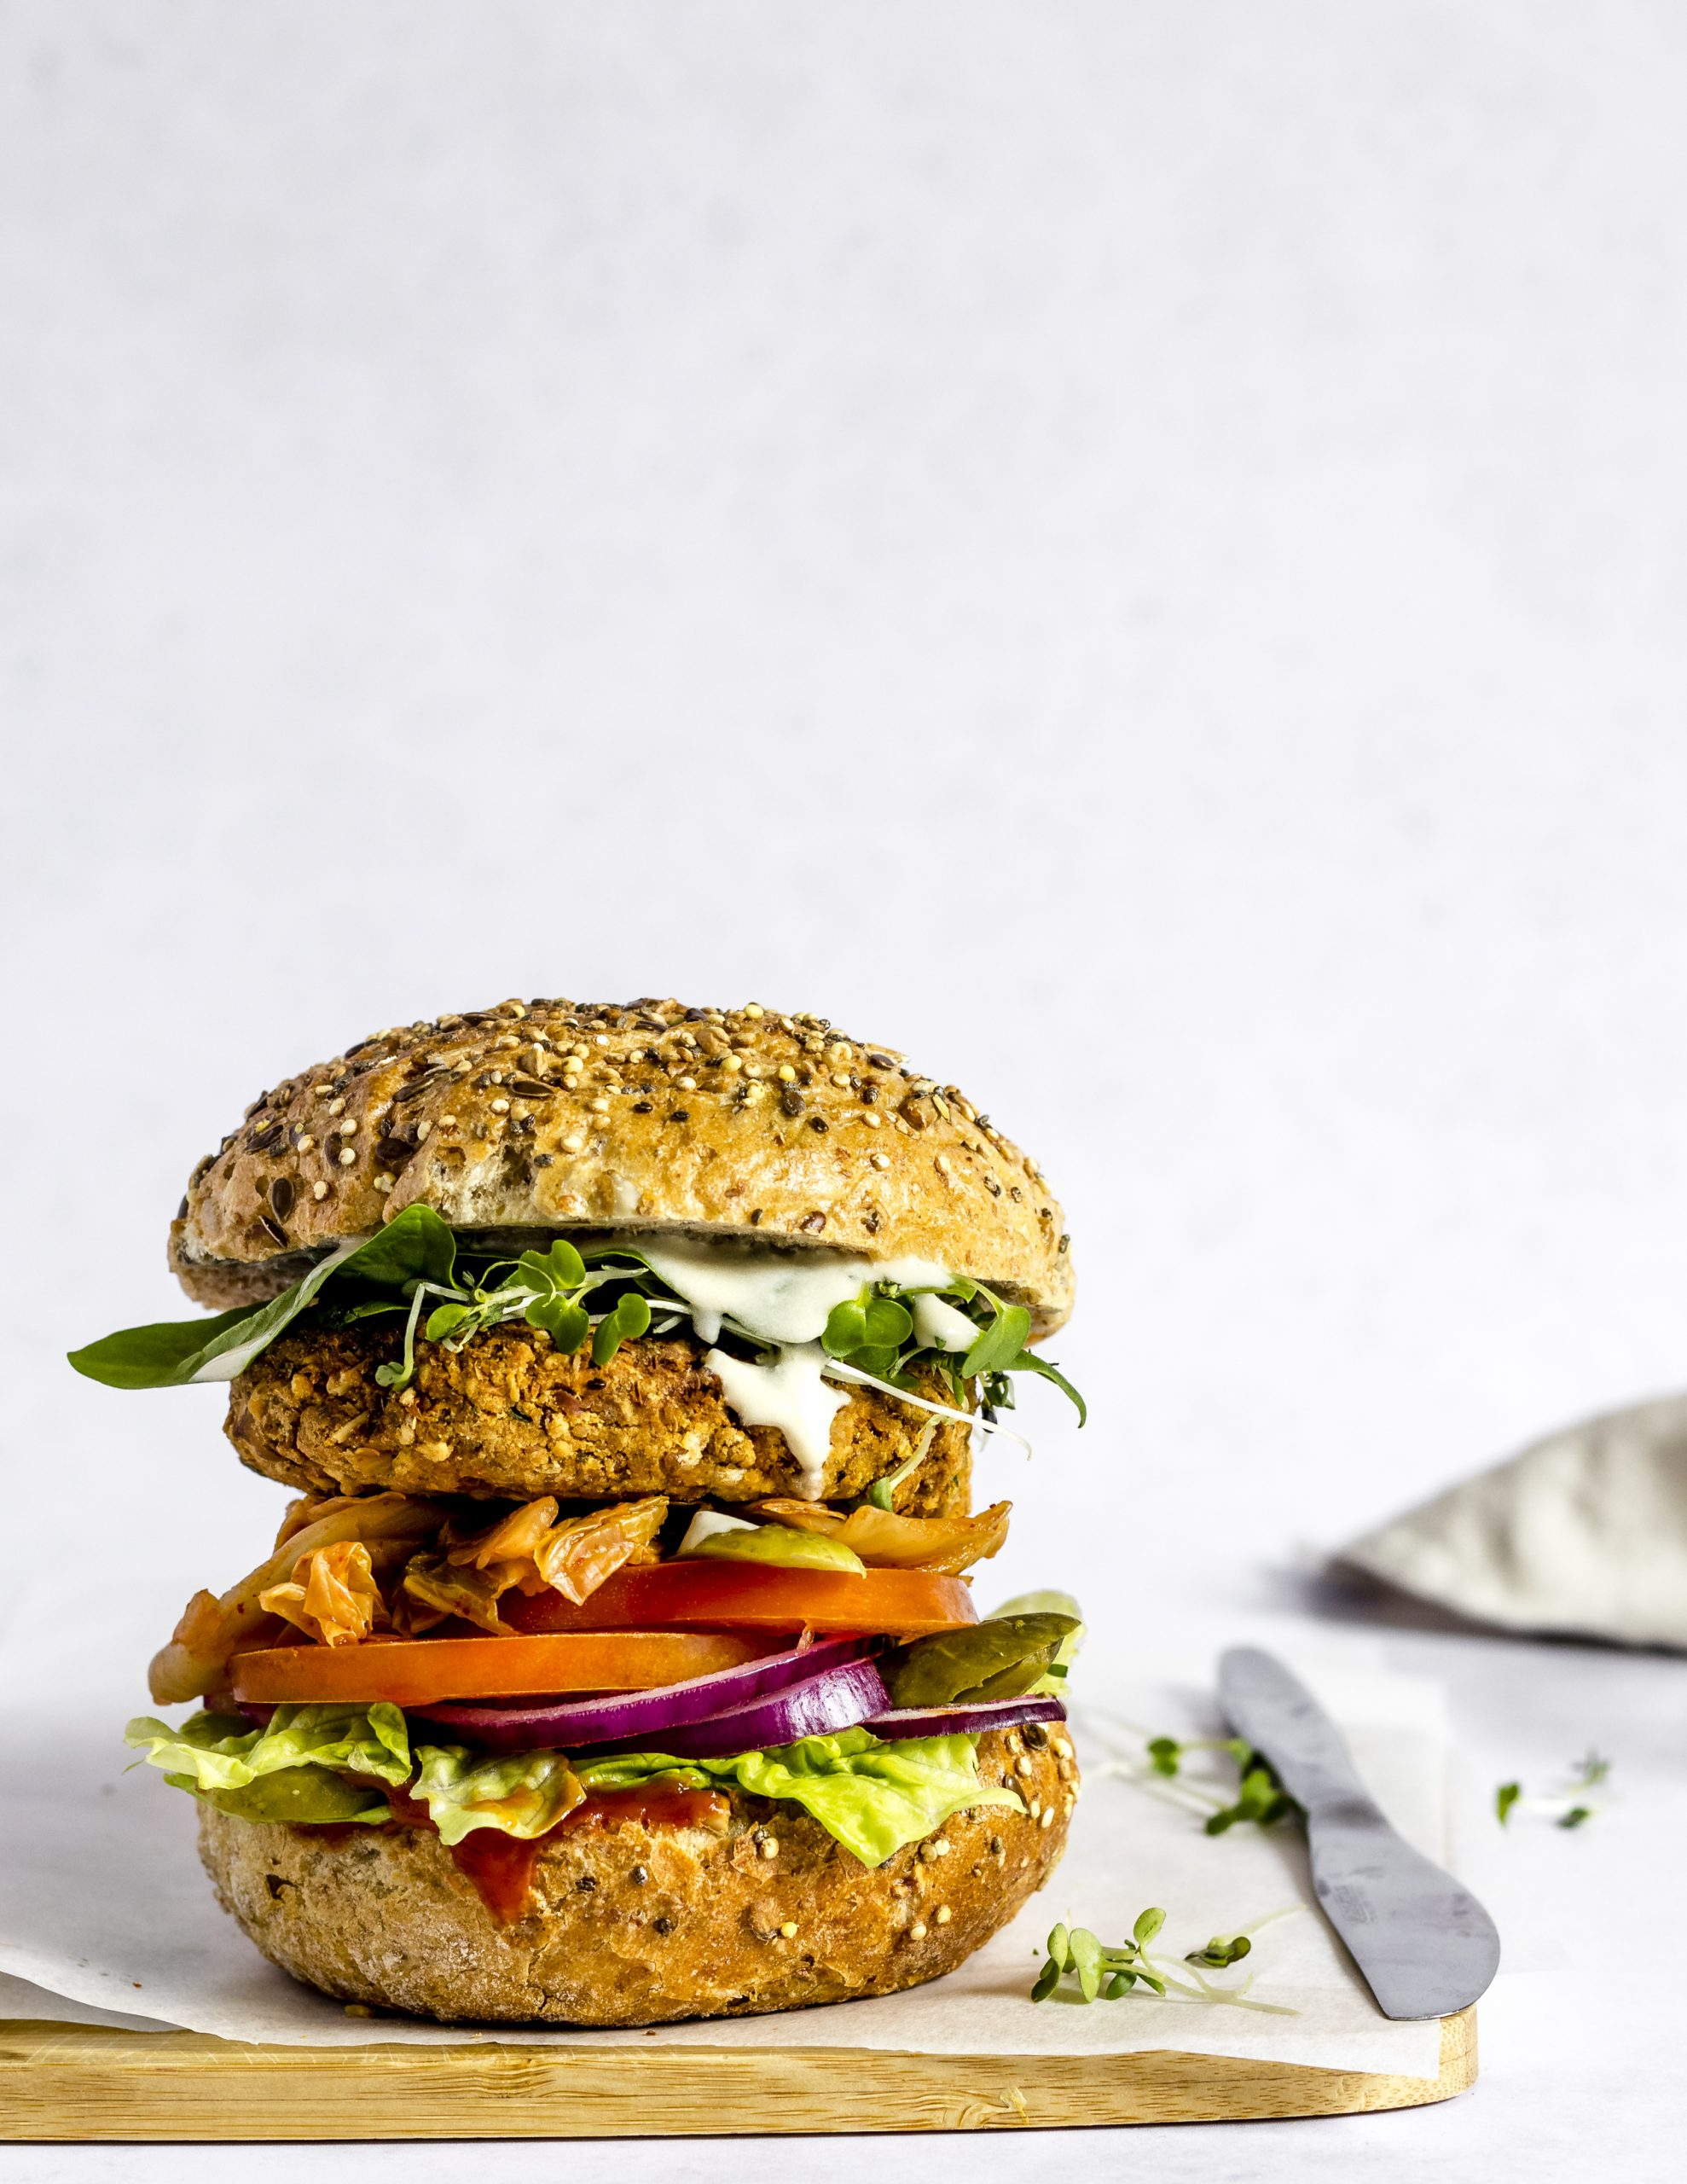 Vegan & Gluten-Free Chickpea Burger